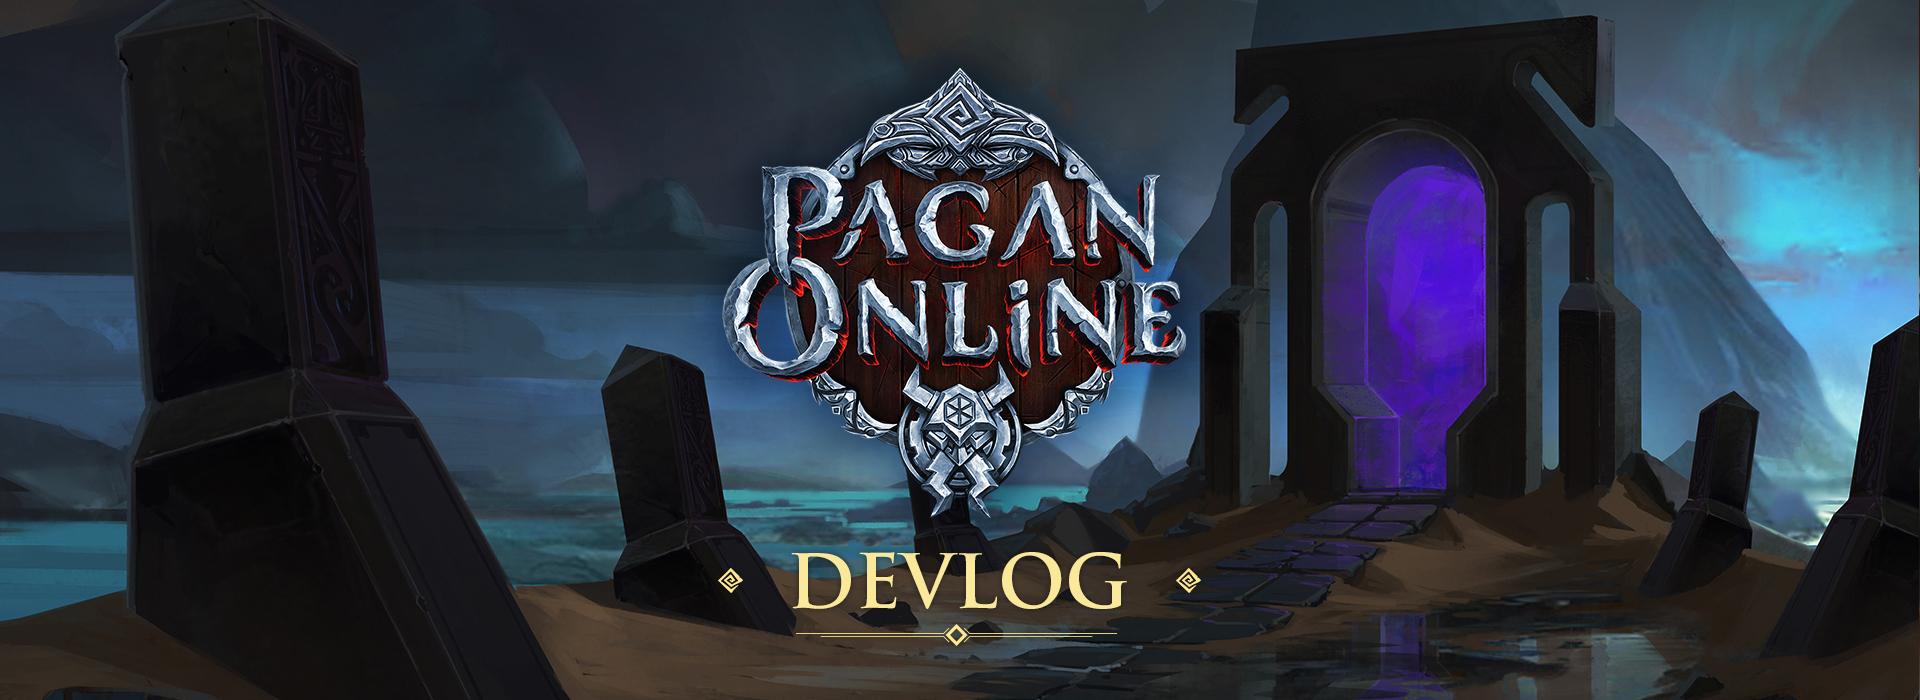 Jul 6 DEVLOG #6: Big F** Patch alert! Pagan Online